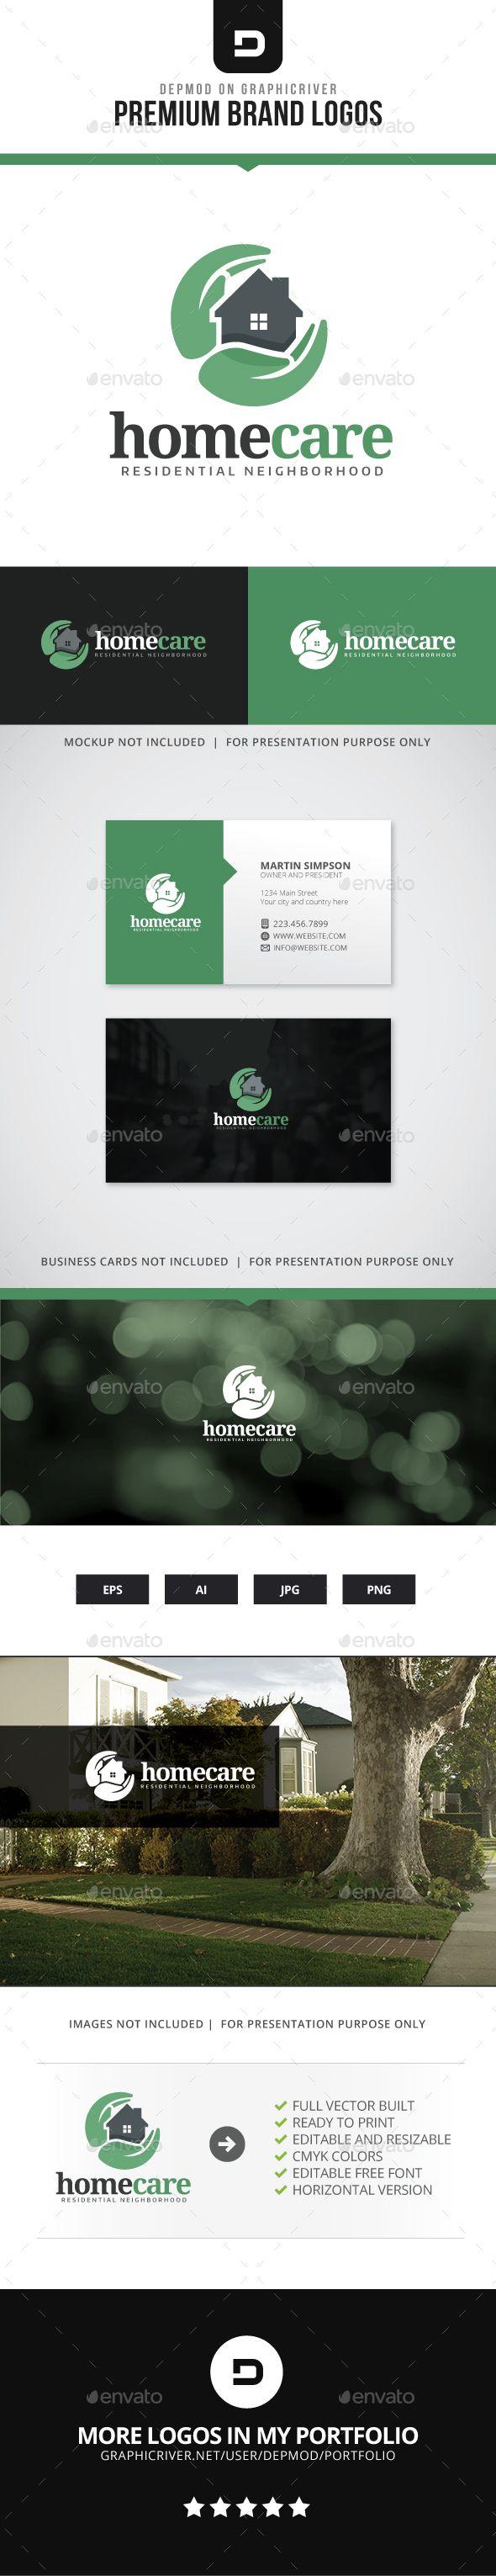 Home Care Logo - Symbols Logo Templates Download here : http://graphicriver.net/item/home-care-logo/15765741?s_rank=152&ref=Al-fatih